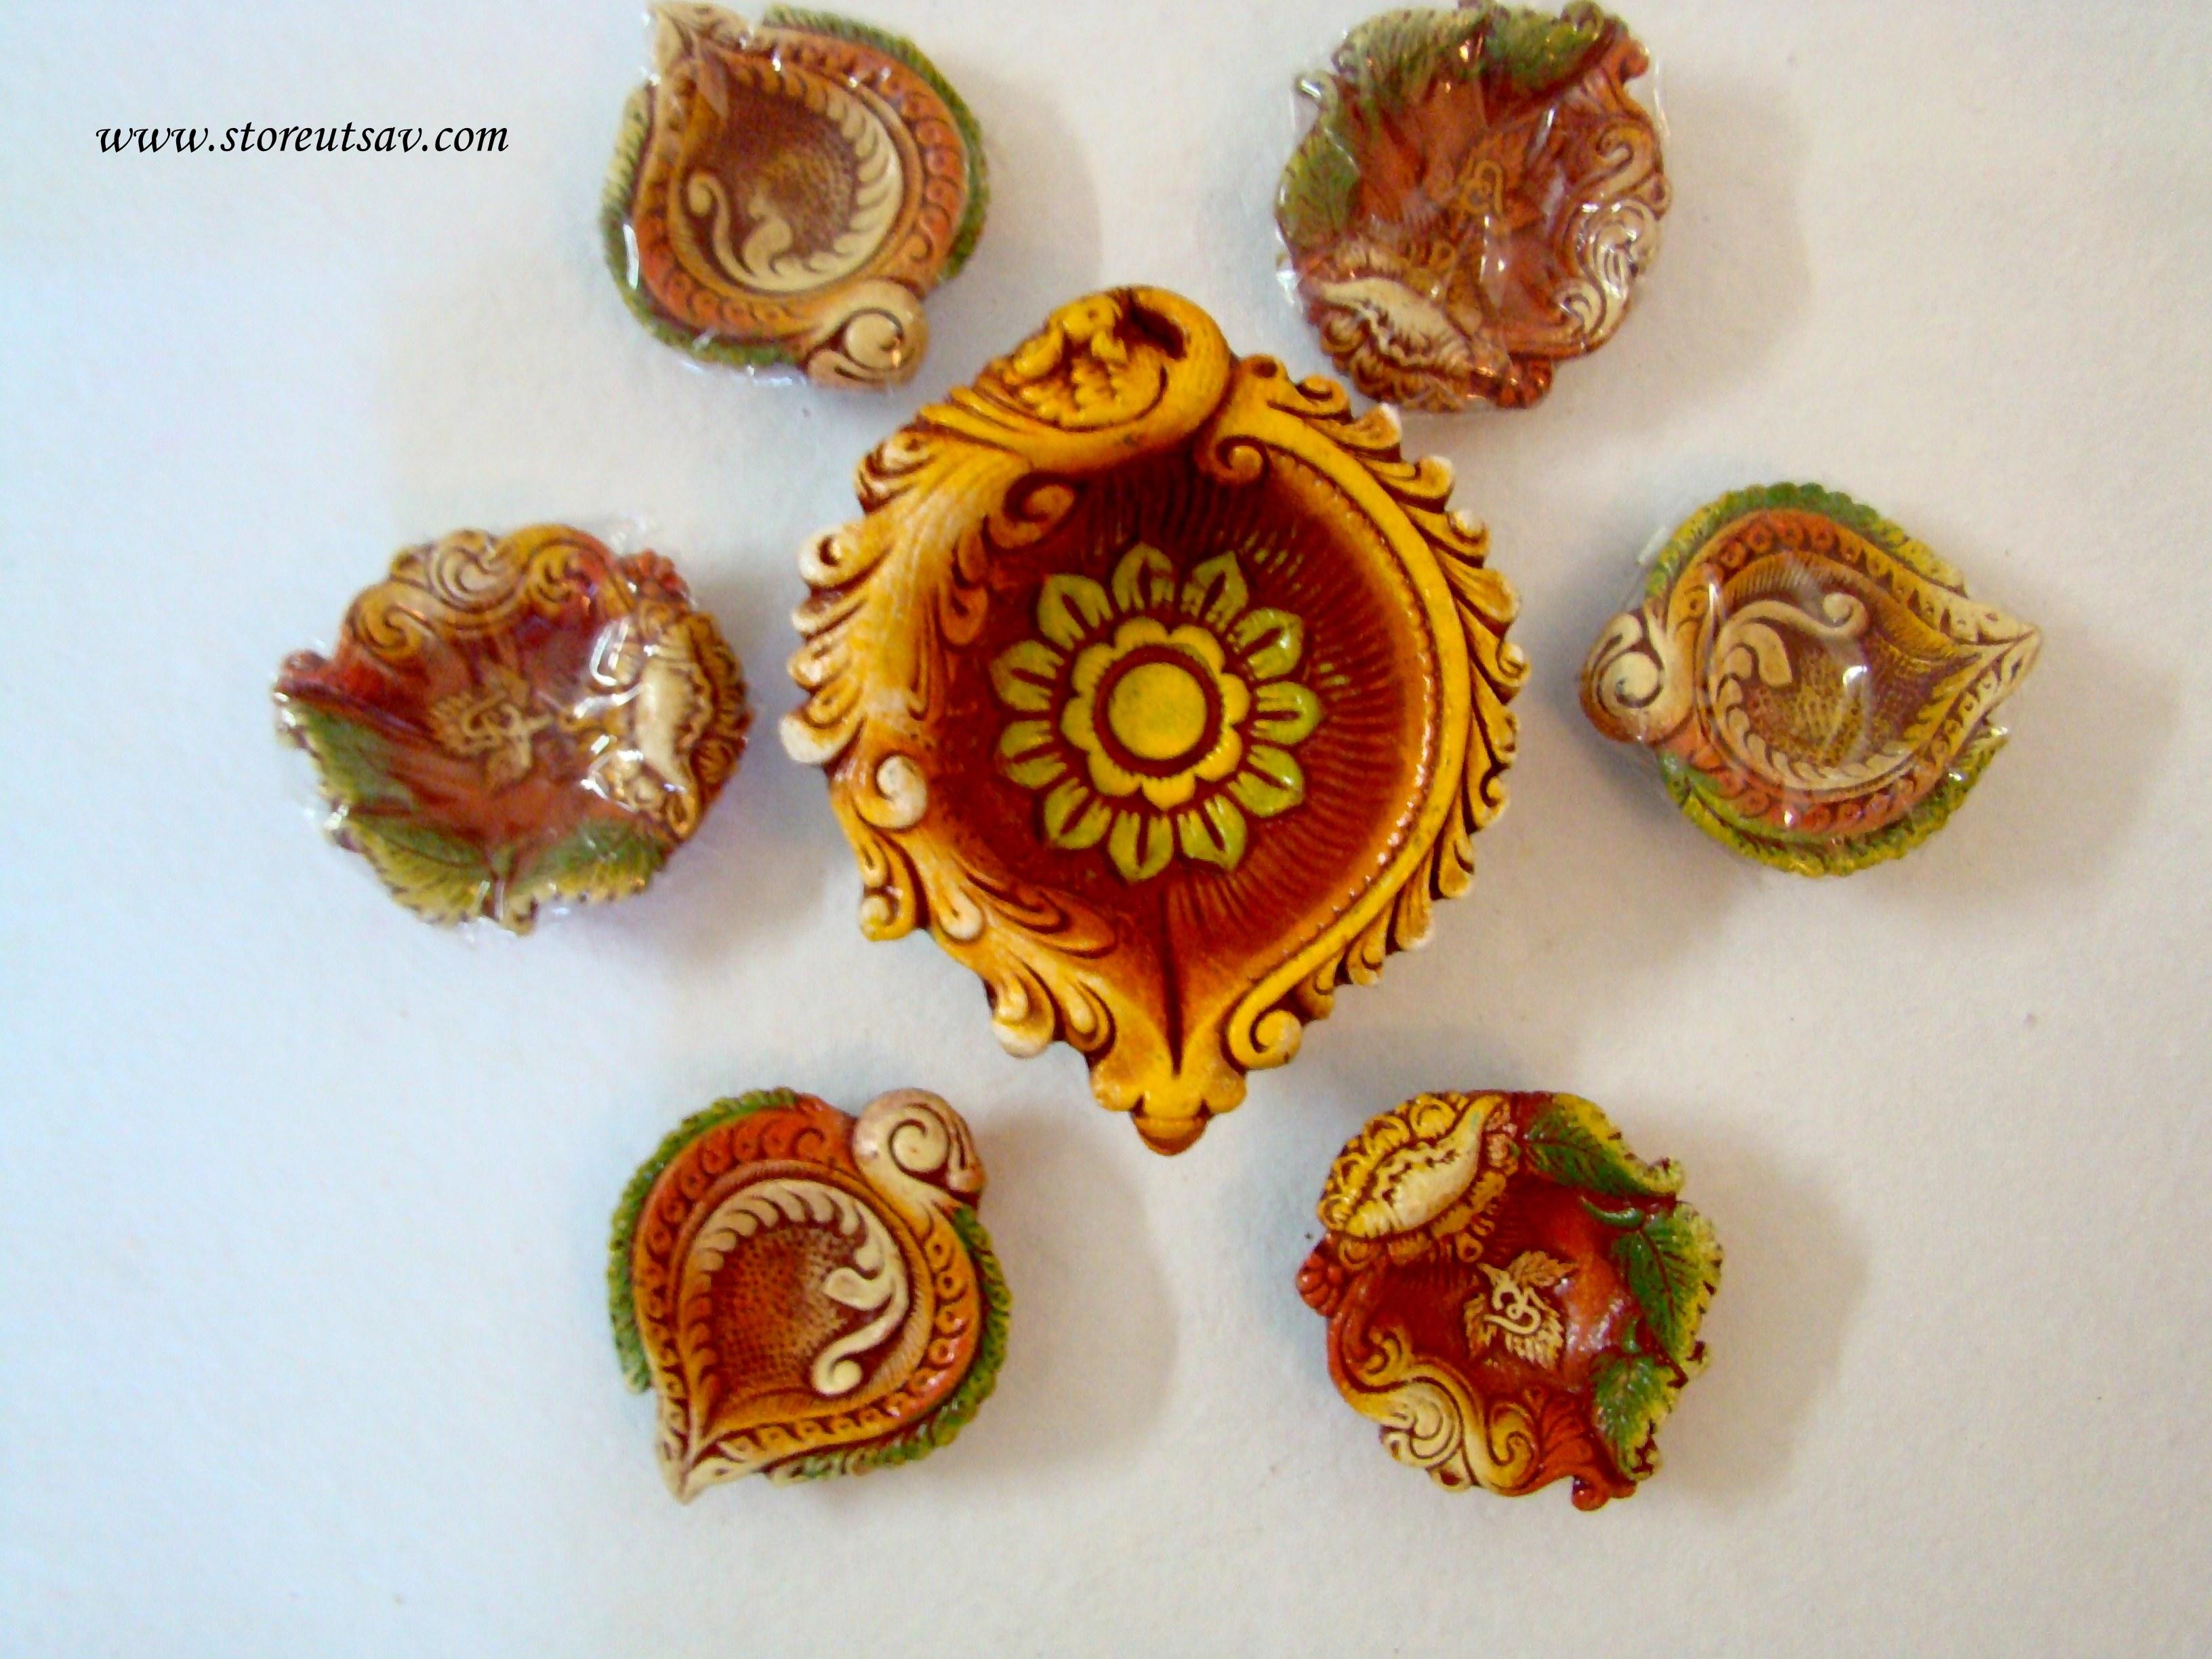 Diwali Diyas Online Shopping India: Rangoli Diyas Terracotta Small Alankar